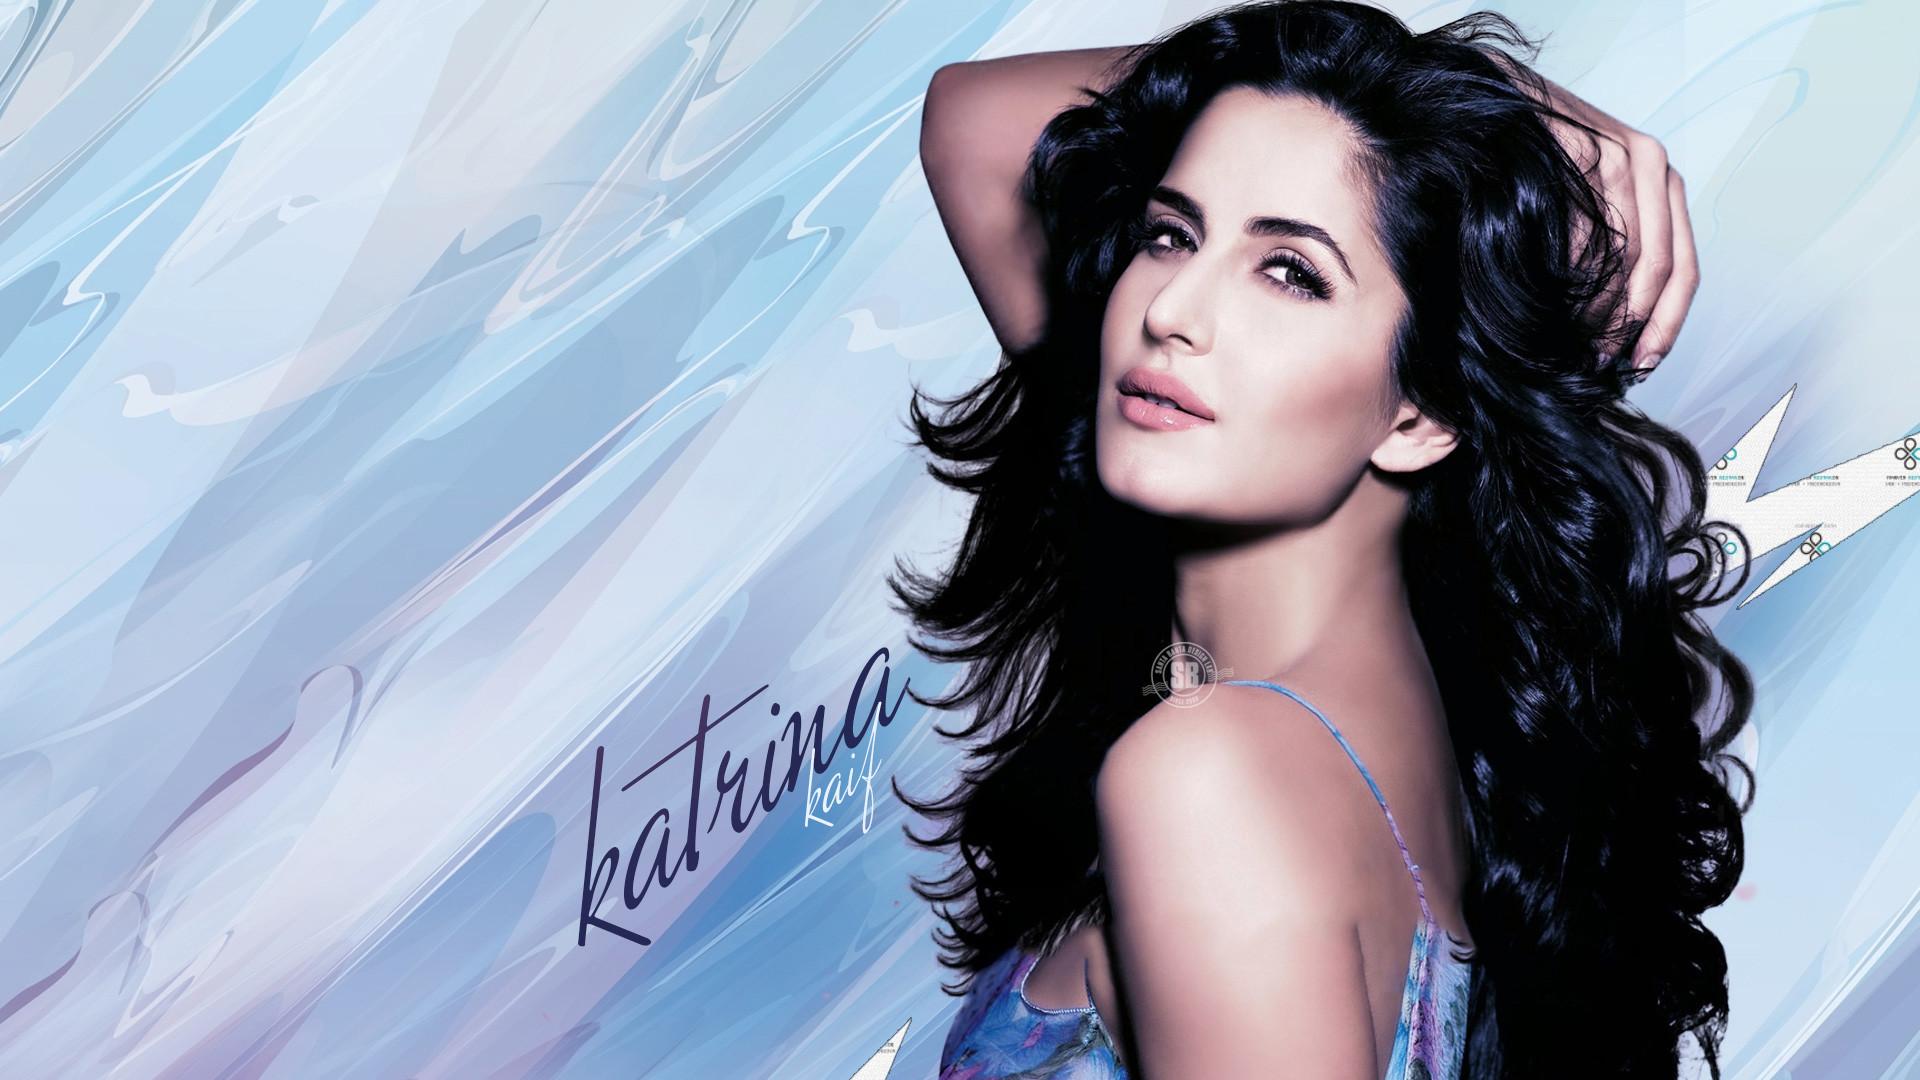 Katrina Kaif sexy photos are available for free download.  beautiful_katrina_kaif_desktop_wallpaper_13 …